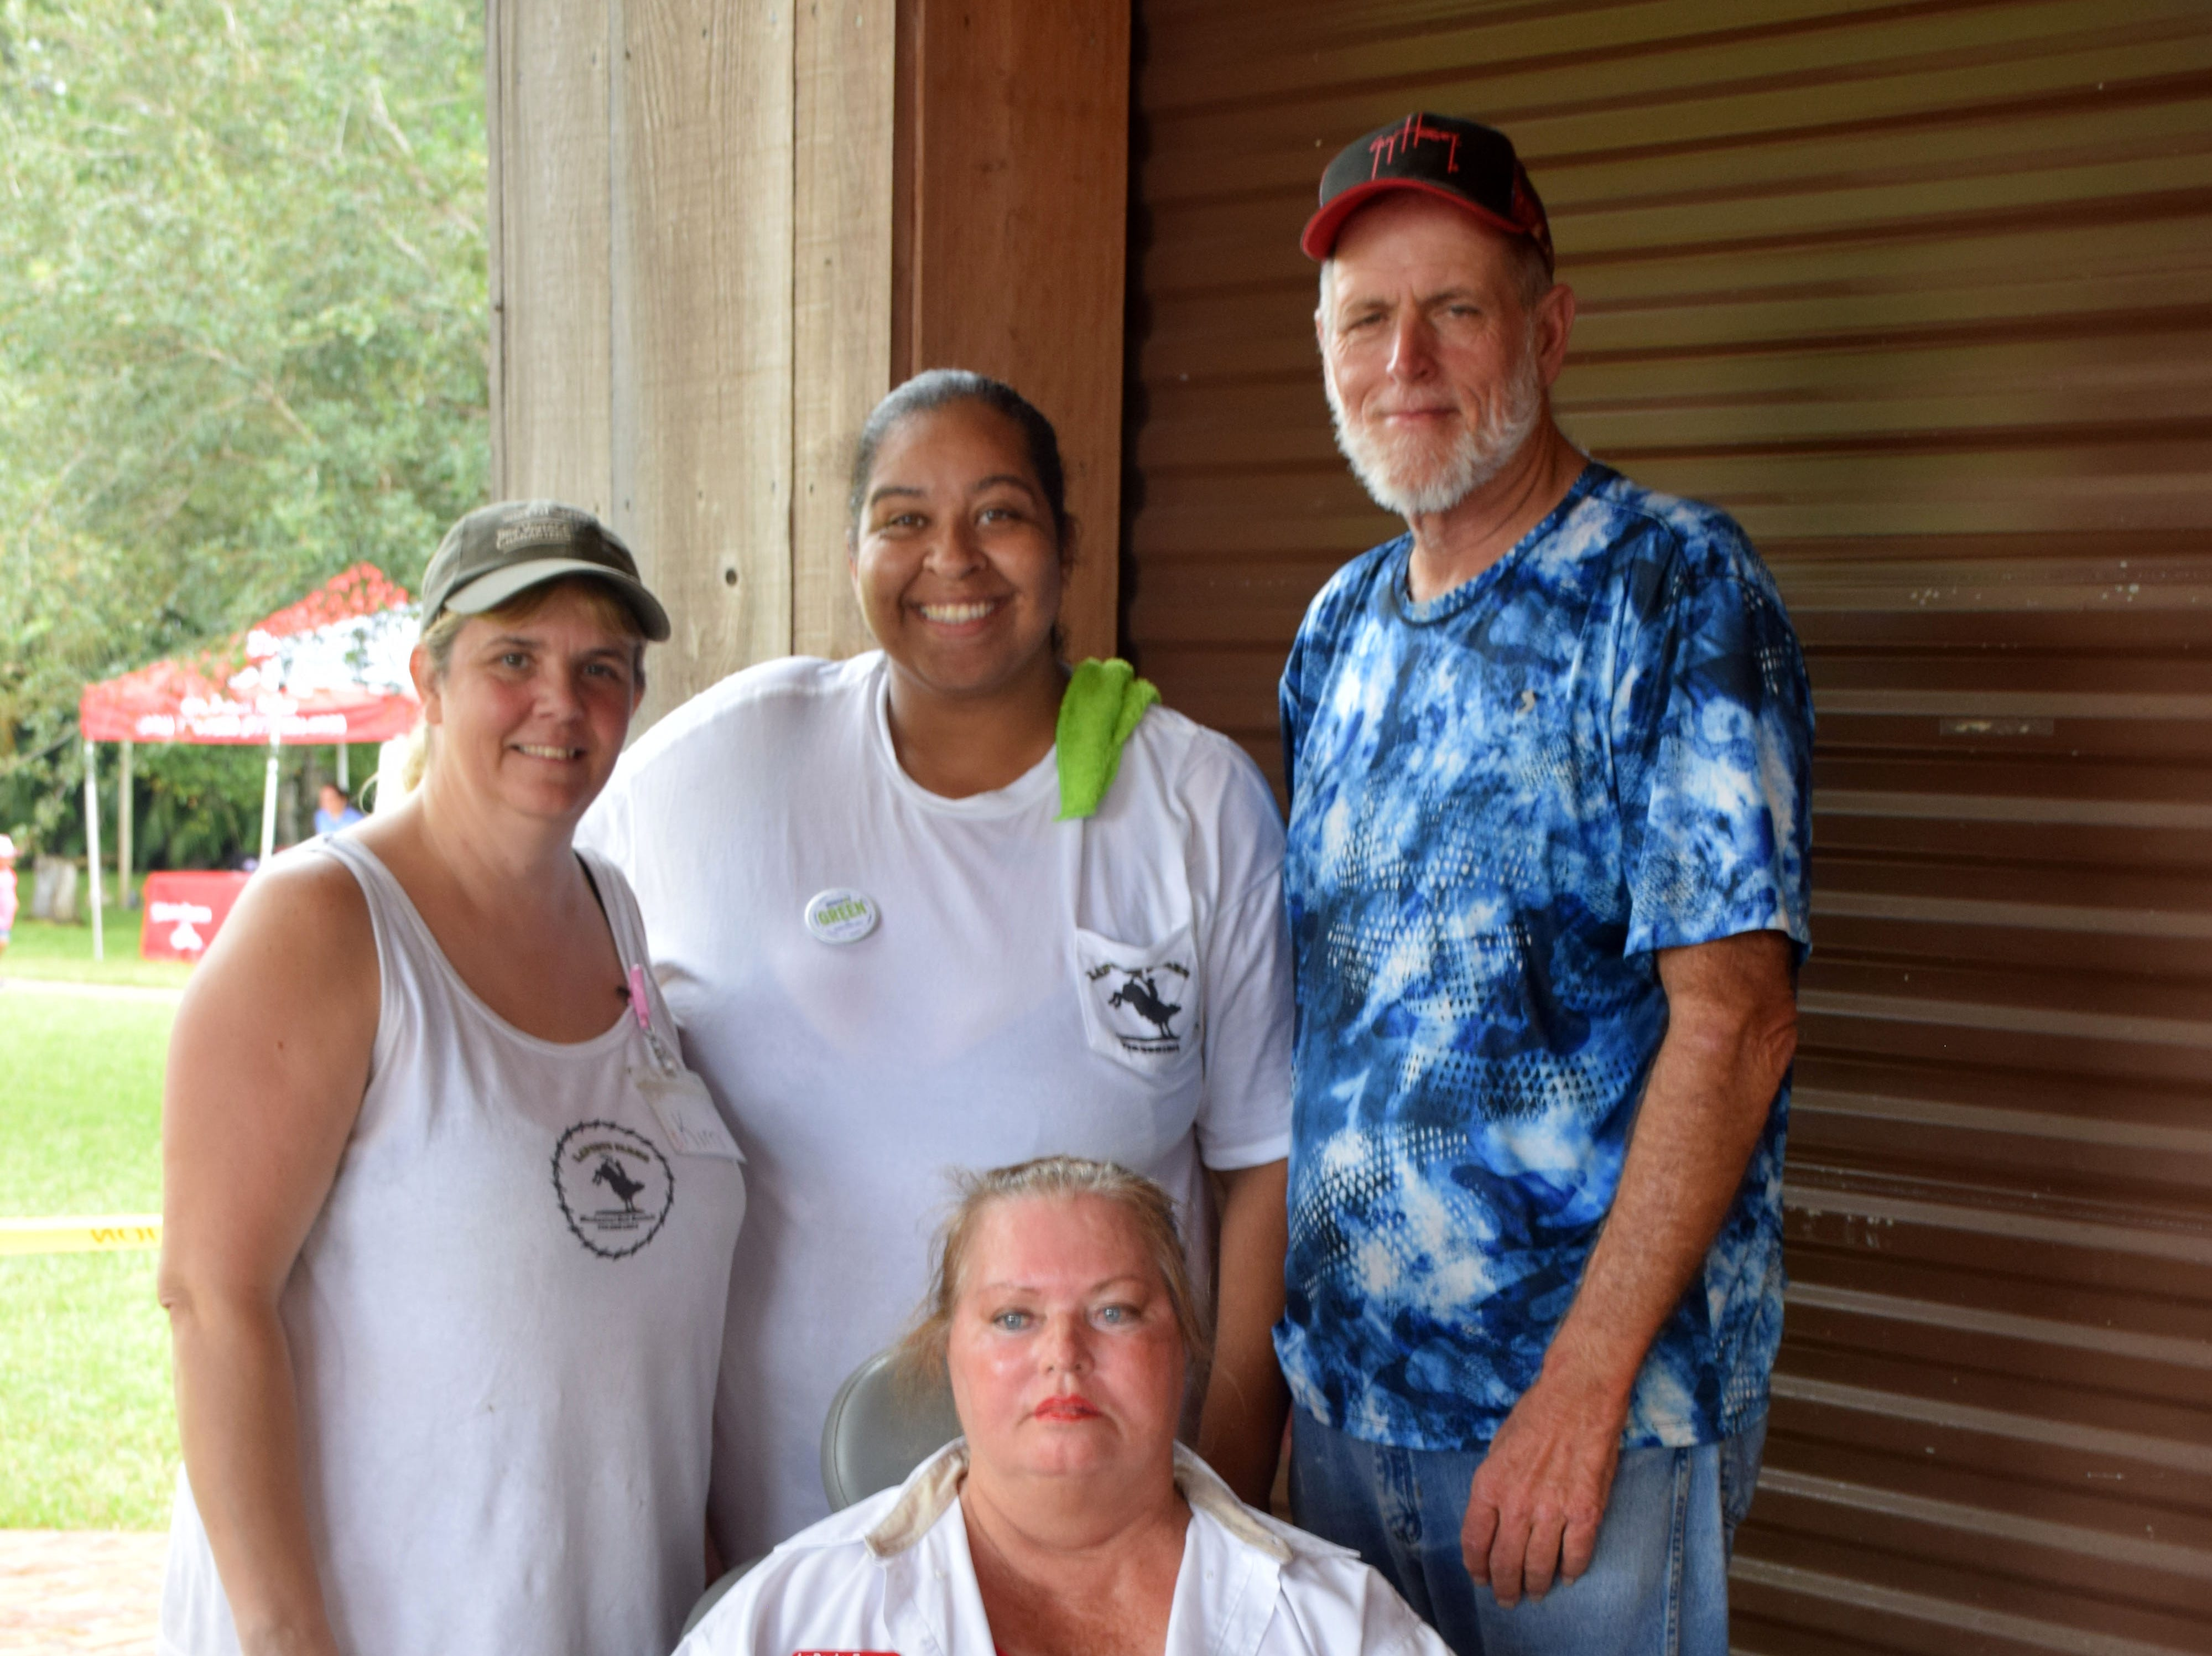 Event volunteers Kim Bohall, Don Molony, Edward Hamilton and Laura LaPorte.